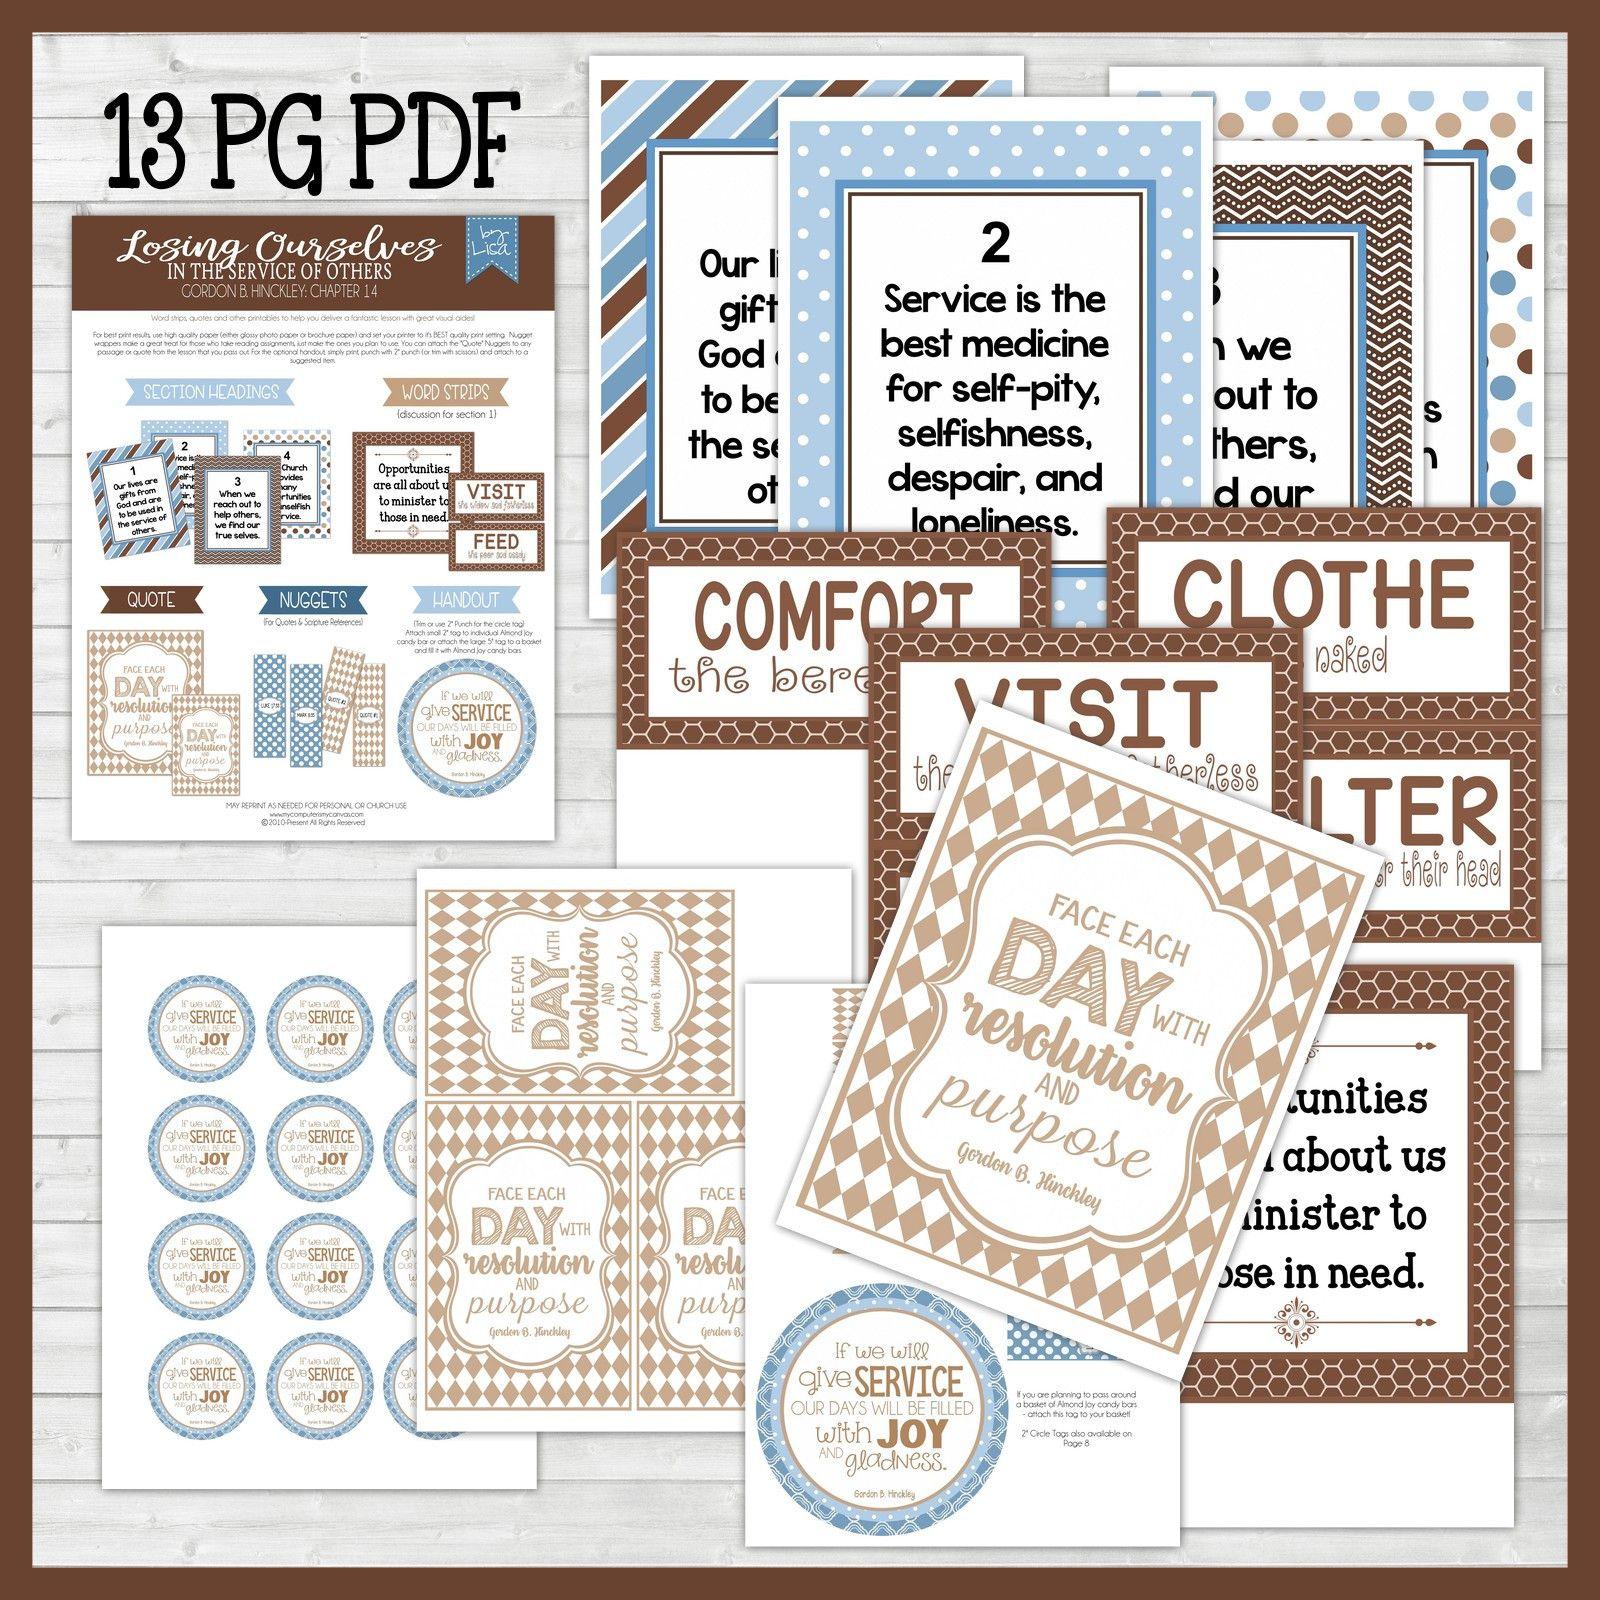 Rs Lesson Kit Gbh Manual 14 Printable